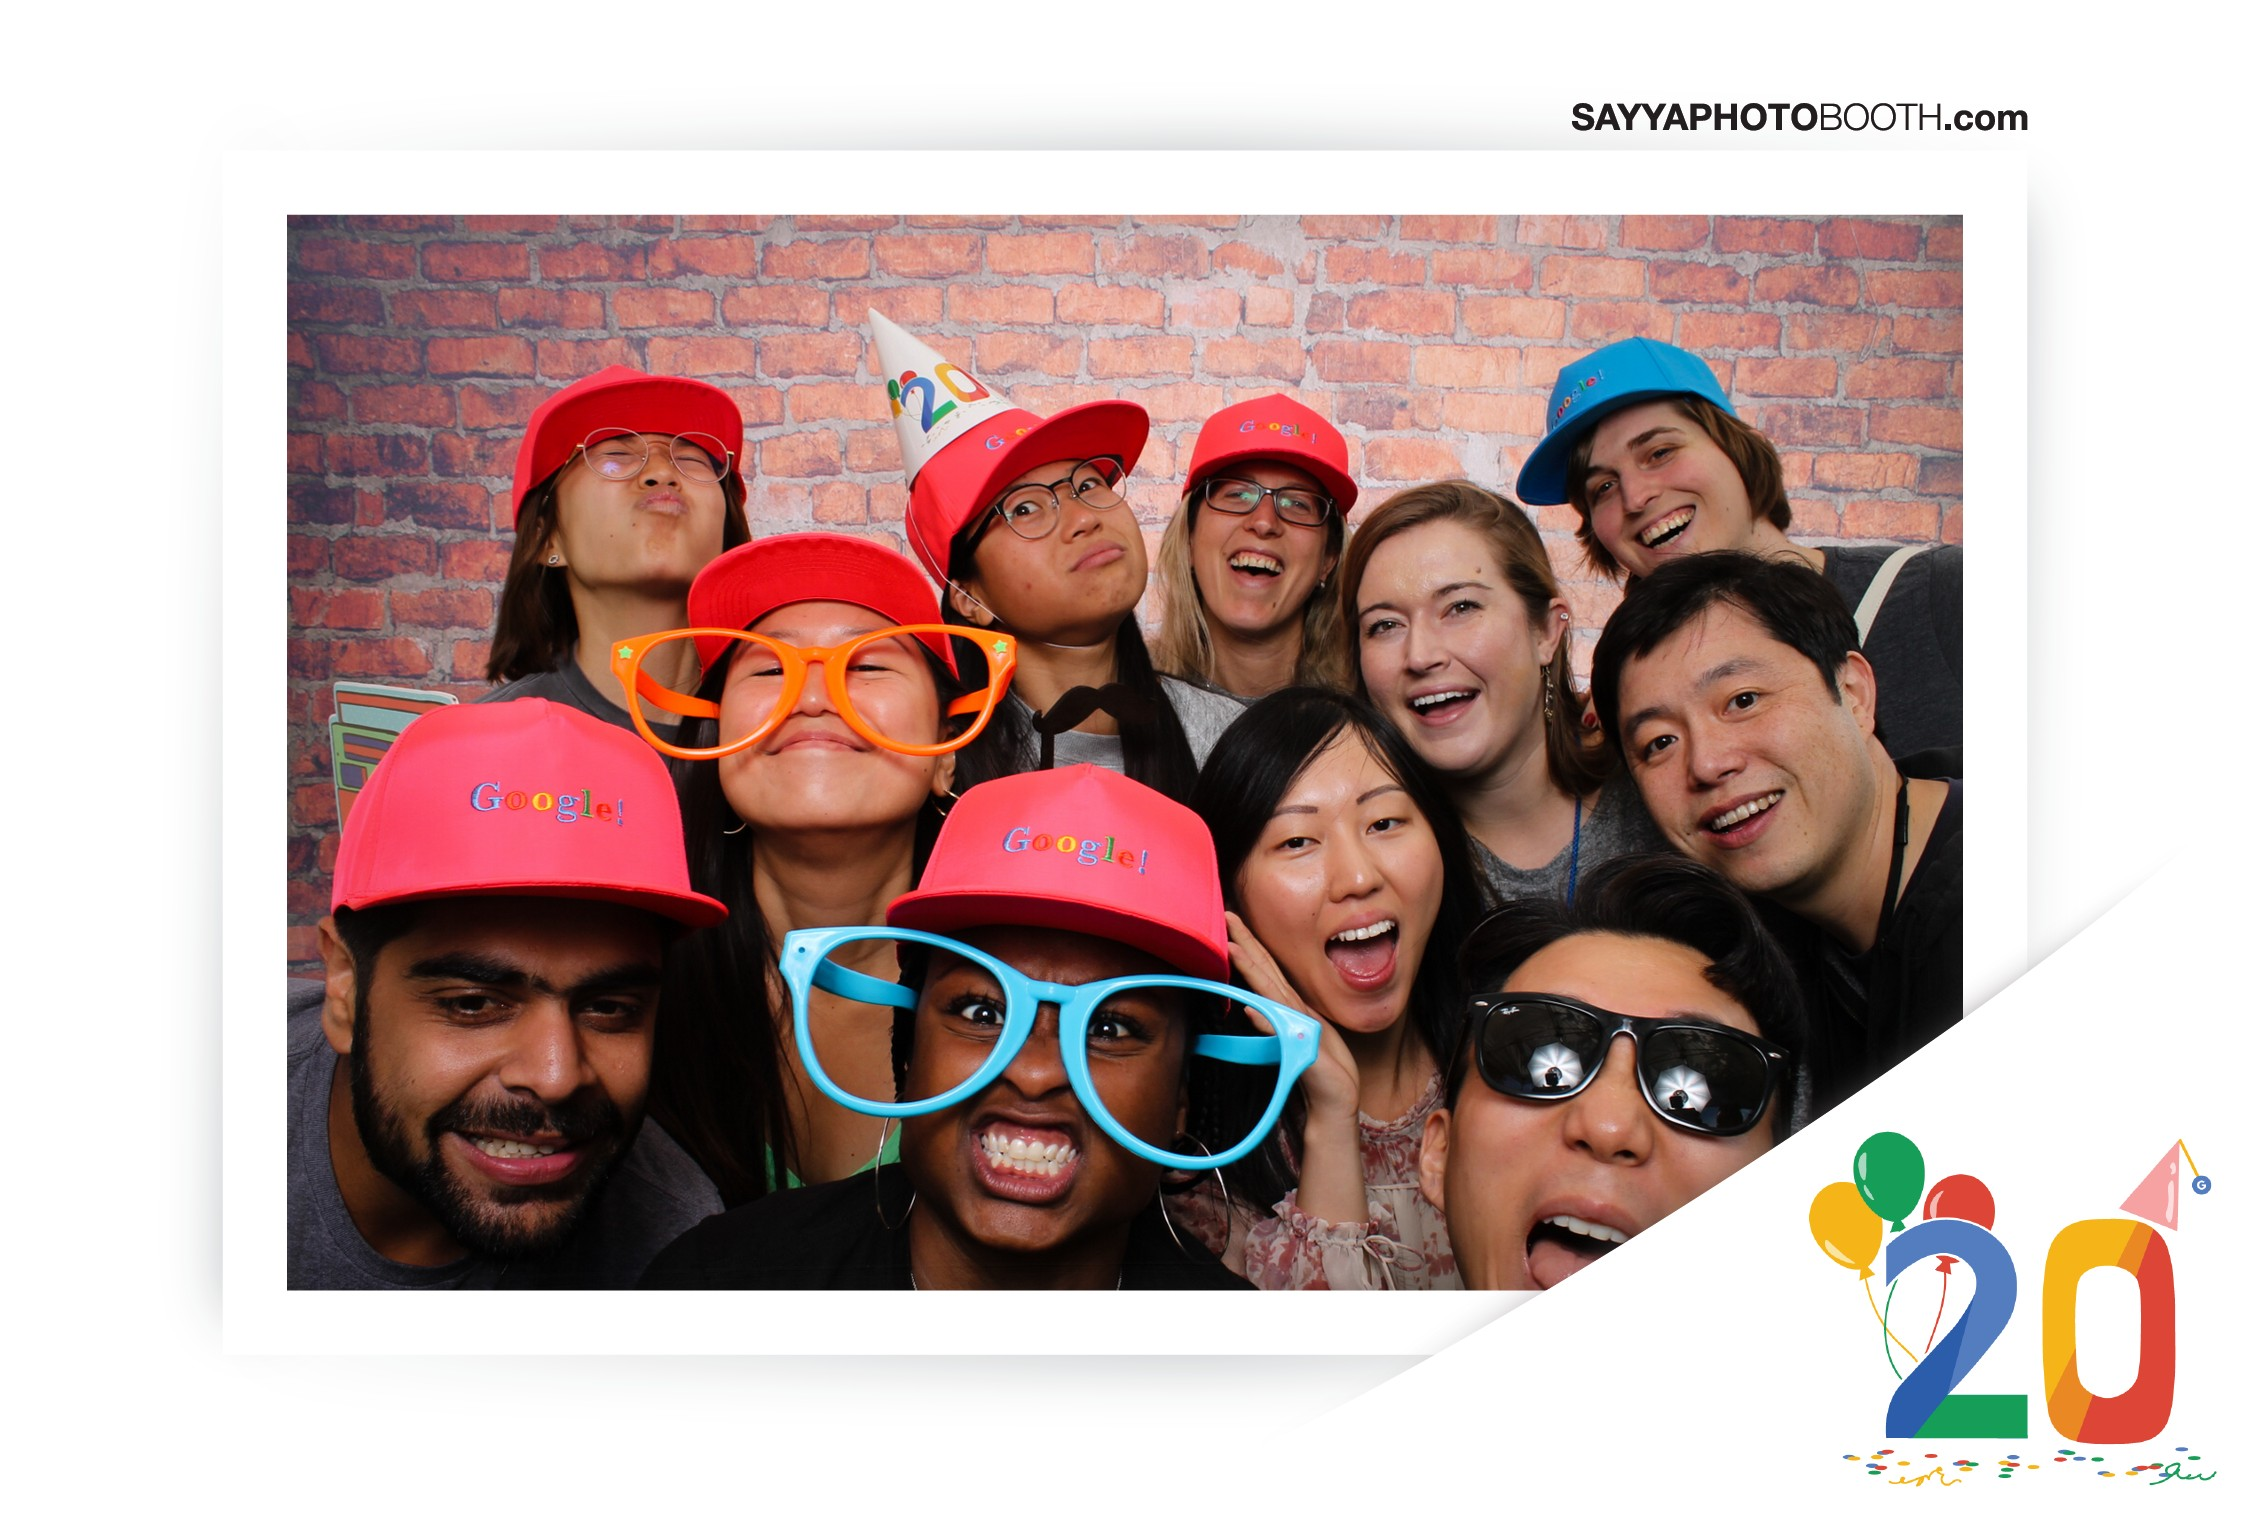 Google's 20th Birthday - Booth 2